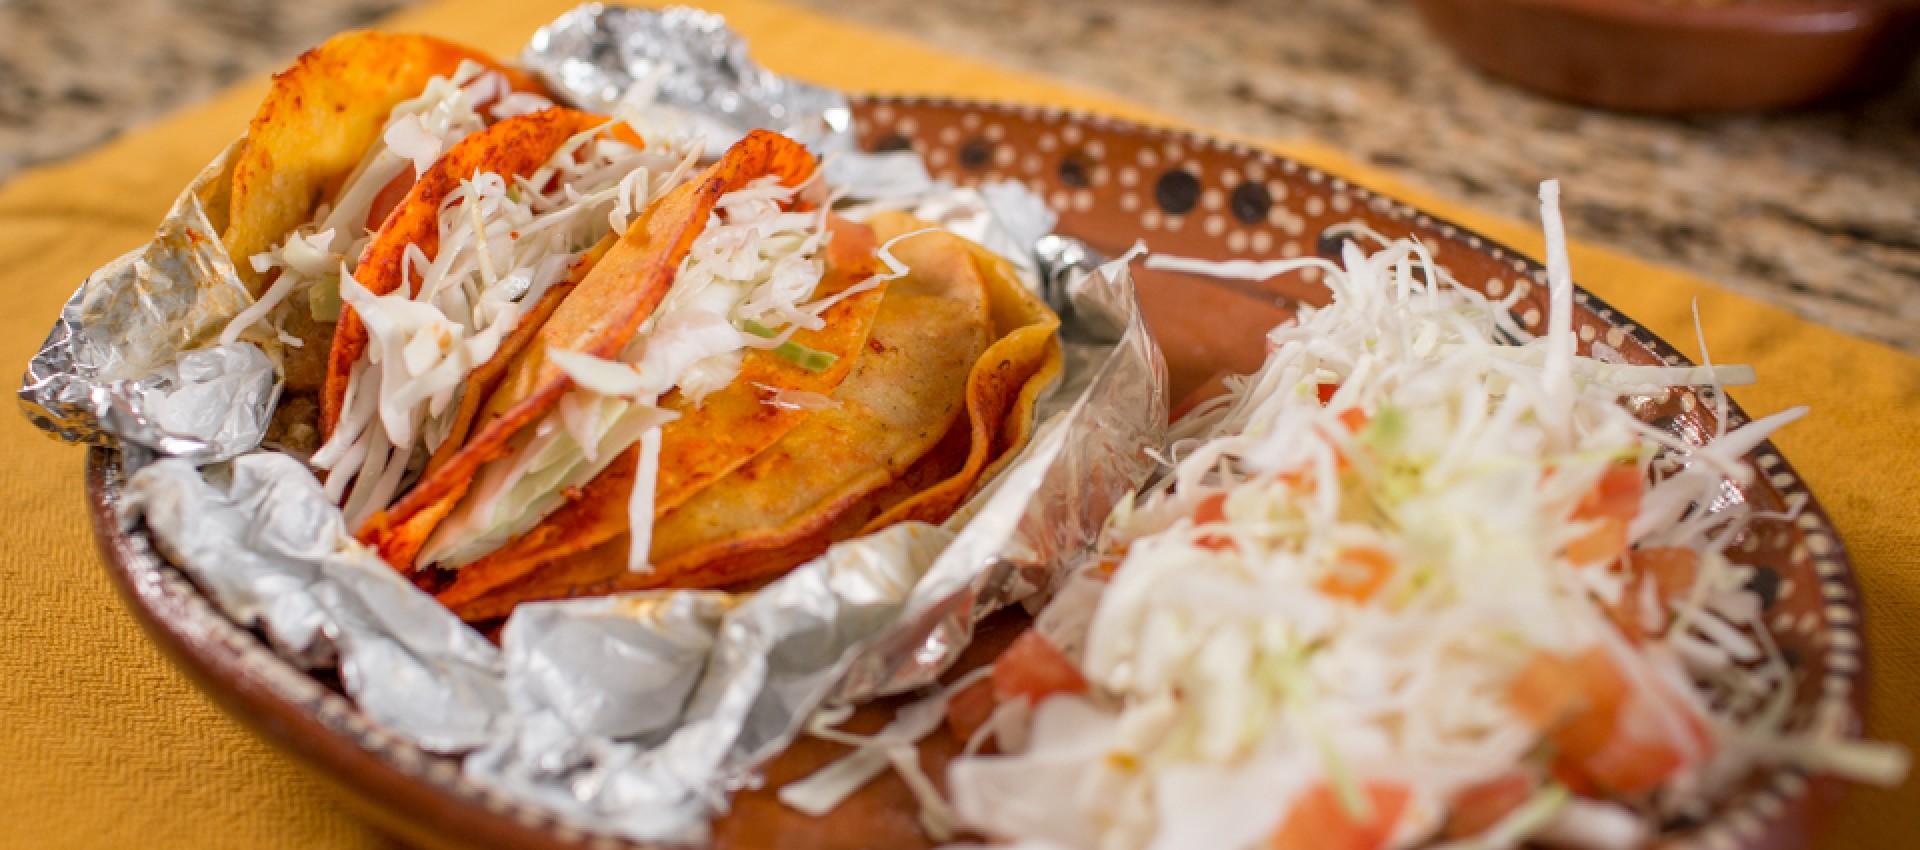 Steamed Tacos Image